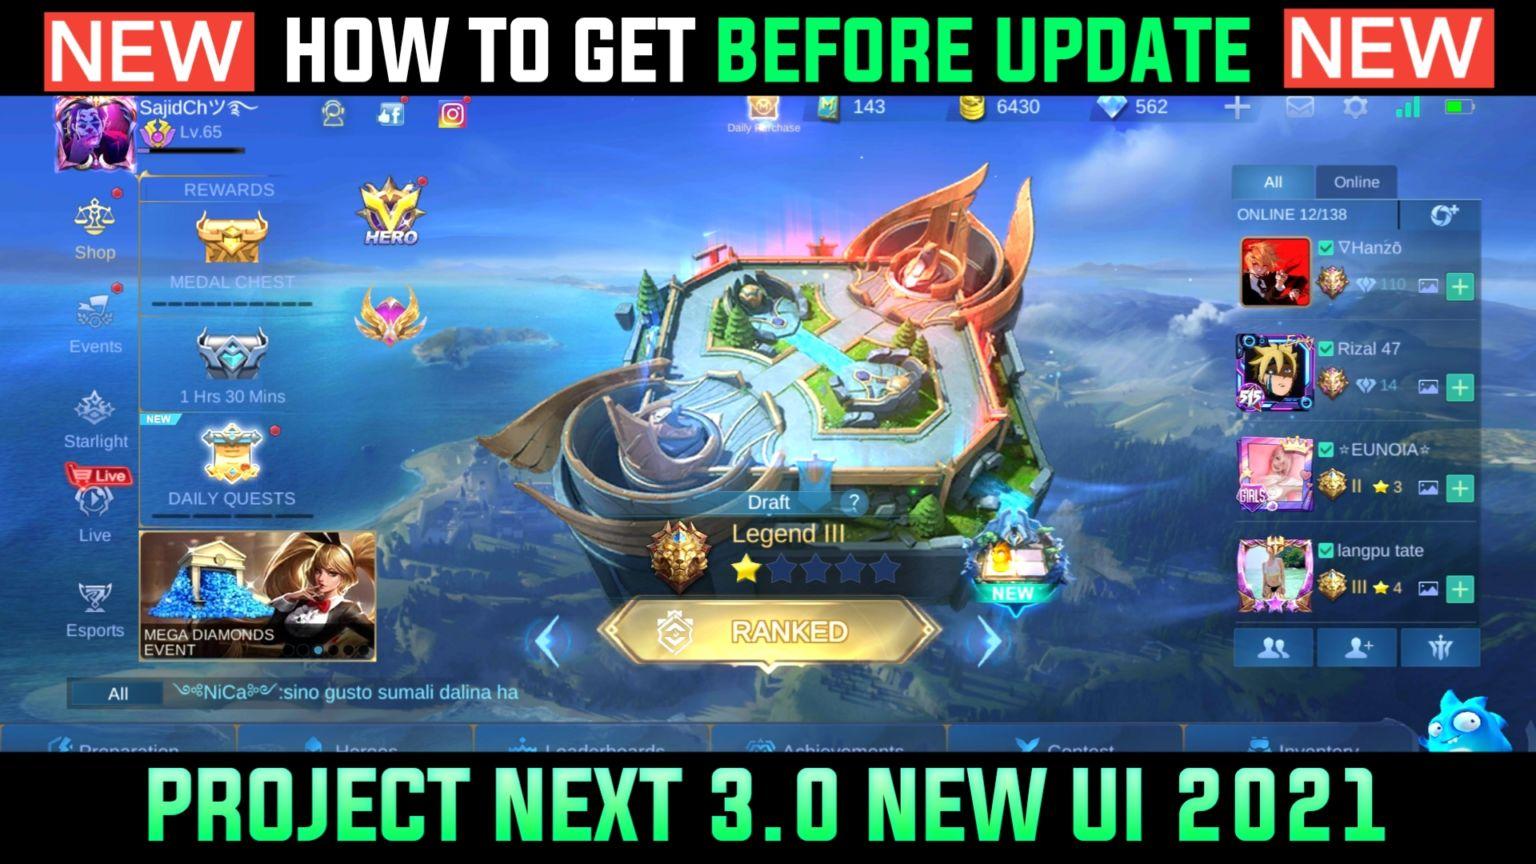 Project Next 3.0 UI এখনই ইনষ্টল করে নিন নতুন আপডেট আসার আগেই [MLBB]